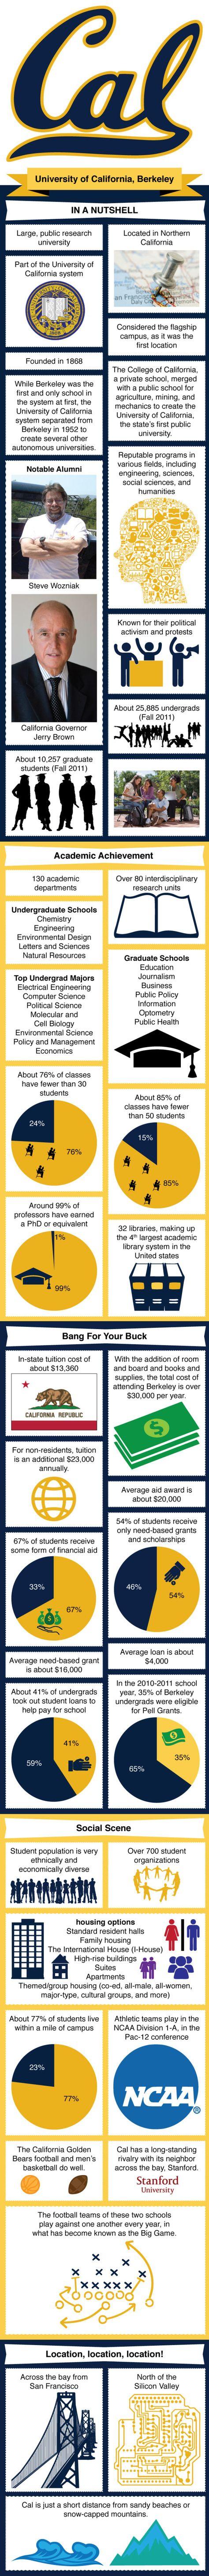 University of California, Berkeley  Infographic